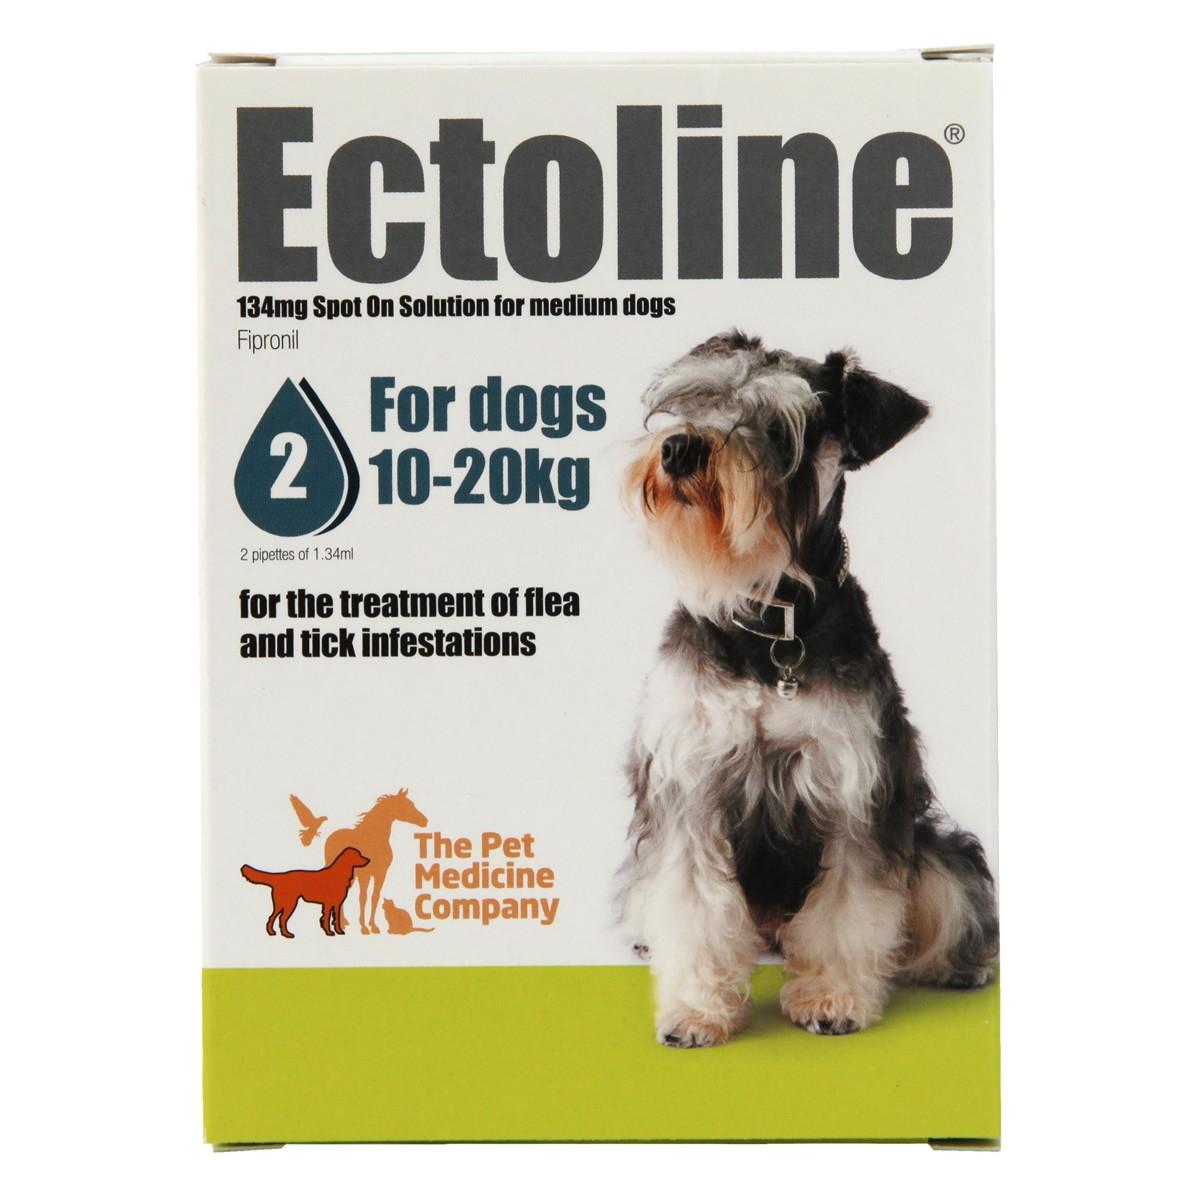 Ectoline Spot-on for Dogs 10-20kg